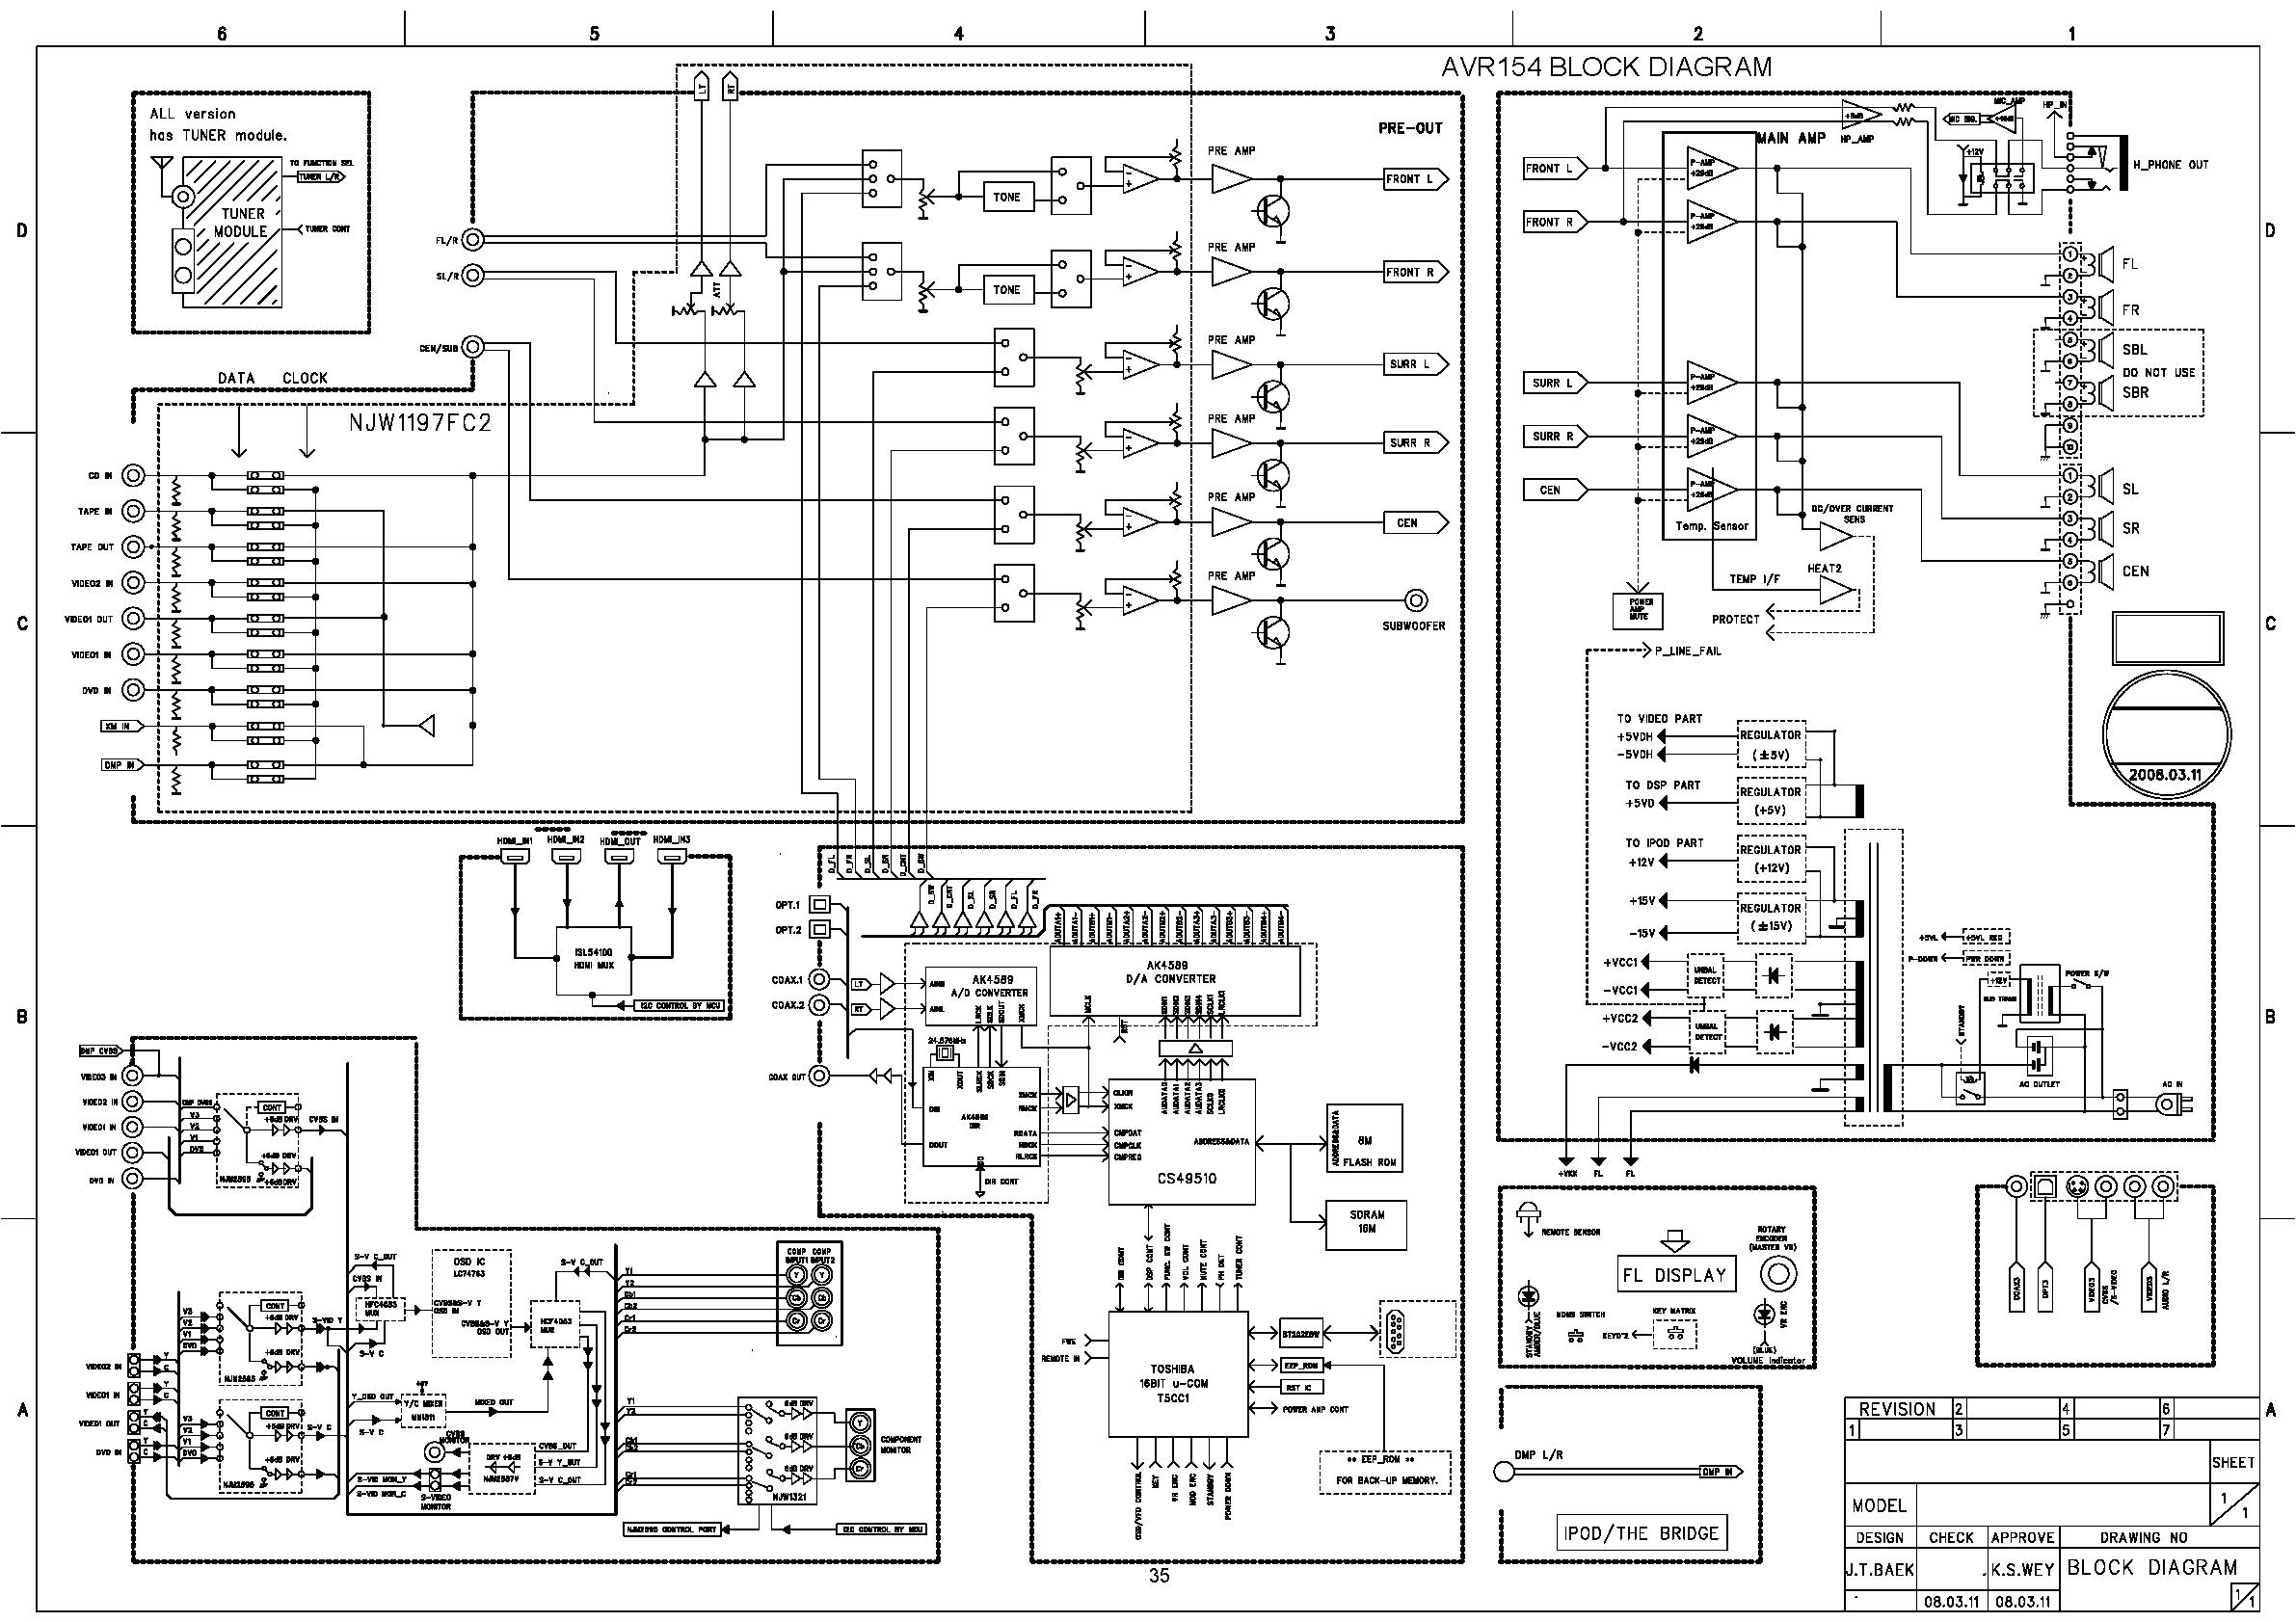 mitsubishi l200 wiring diagram needed wiring diagram name mitsubishi l200 wiring diagram needed wiring diagrams long